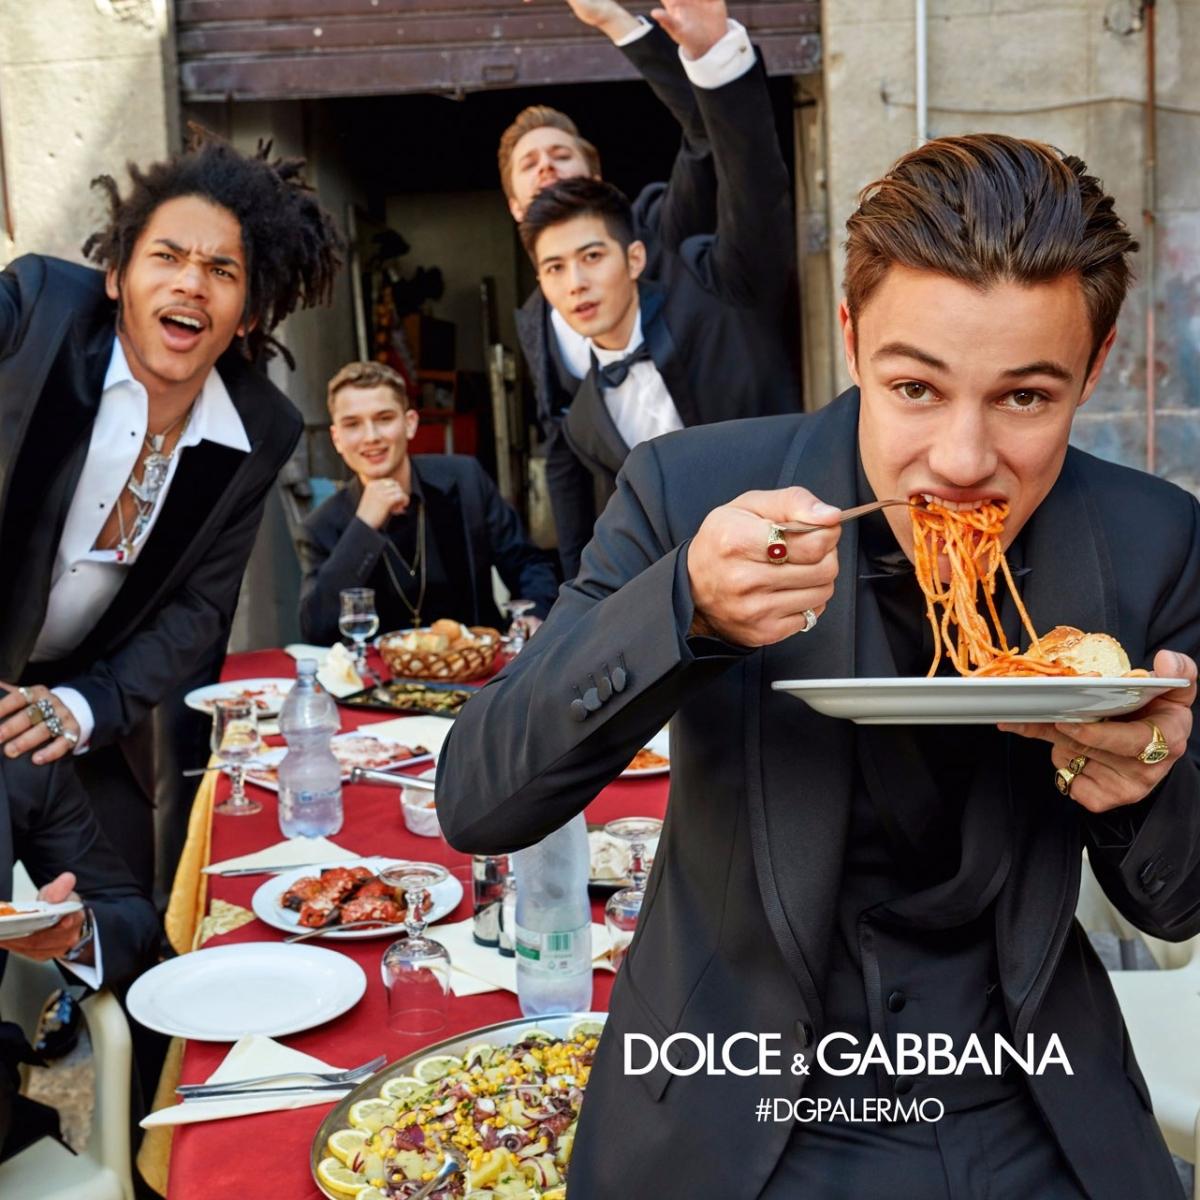 Dolce&Gabbana 18FW 再打網紅牌,幫個忙請把模特兒的工作還給模特兒